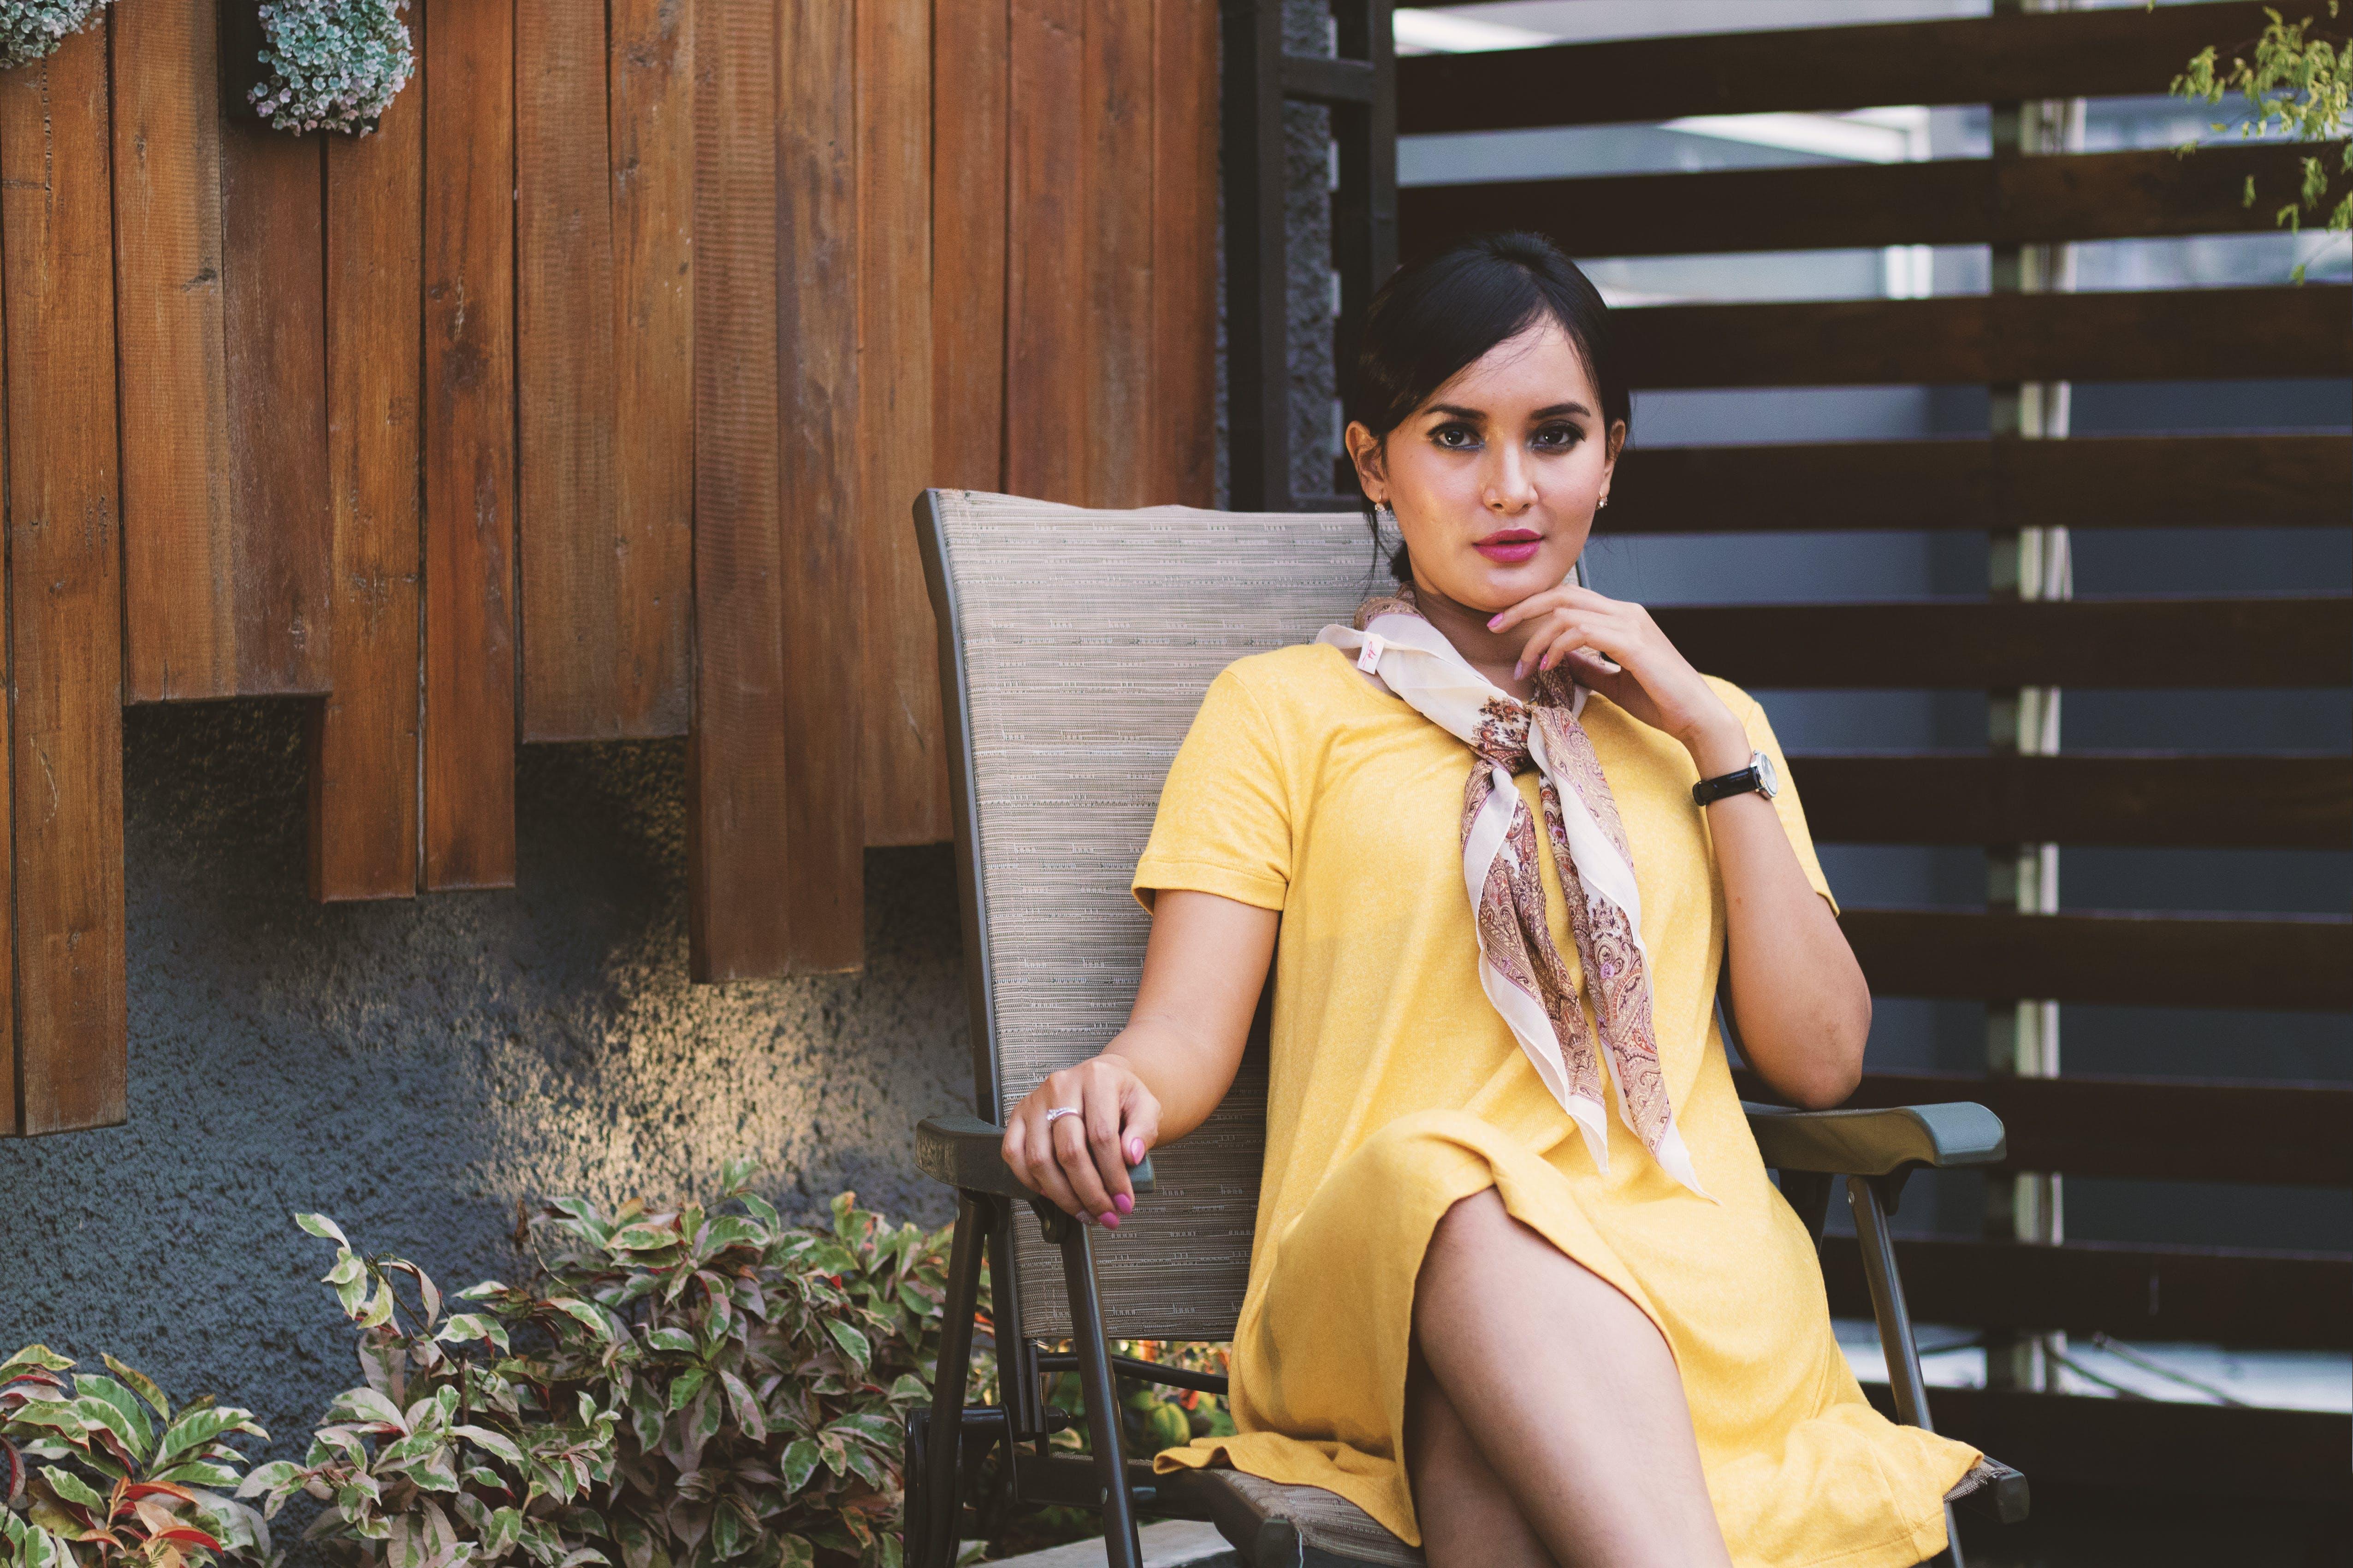 Woman Wearing Yellow Short-sleeved dress Sitting on Black Metal Armchair